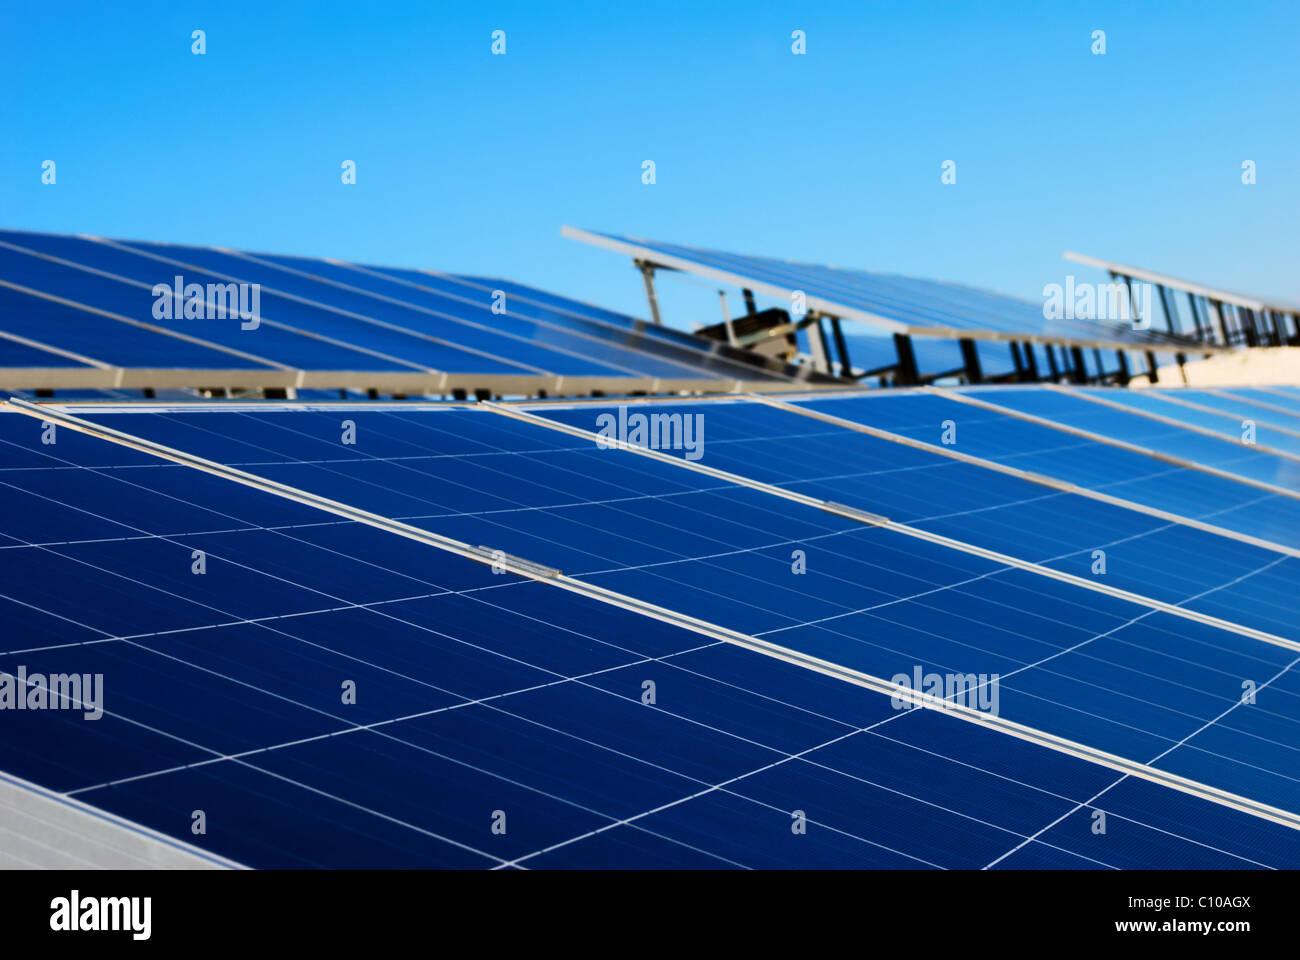 Blue solar panel installation - Stock Image